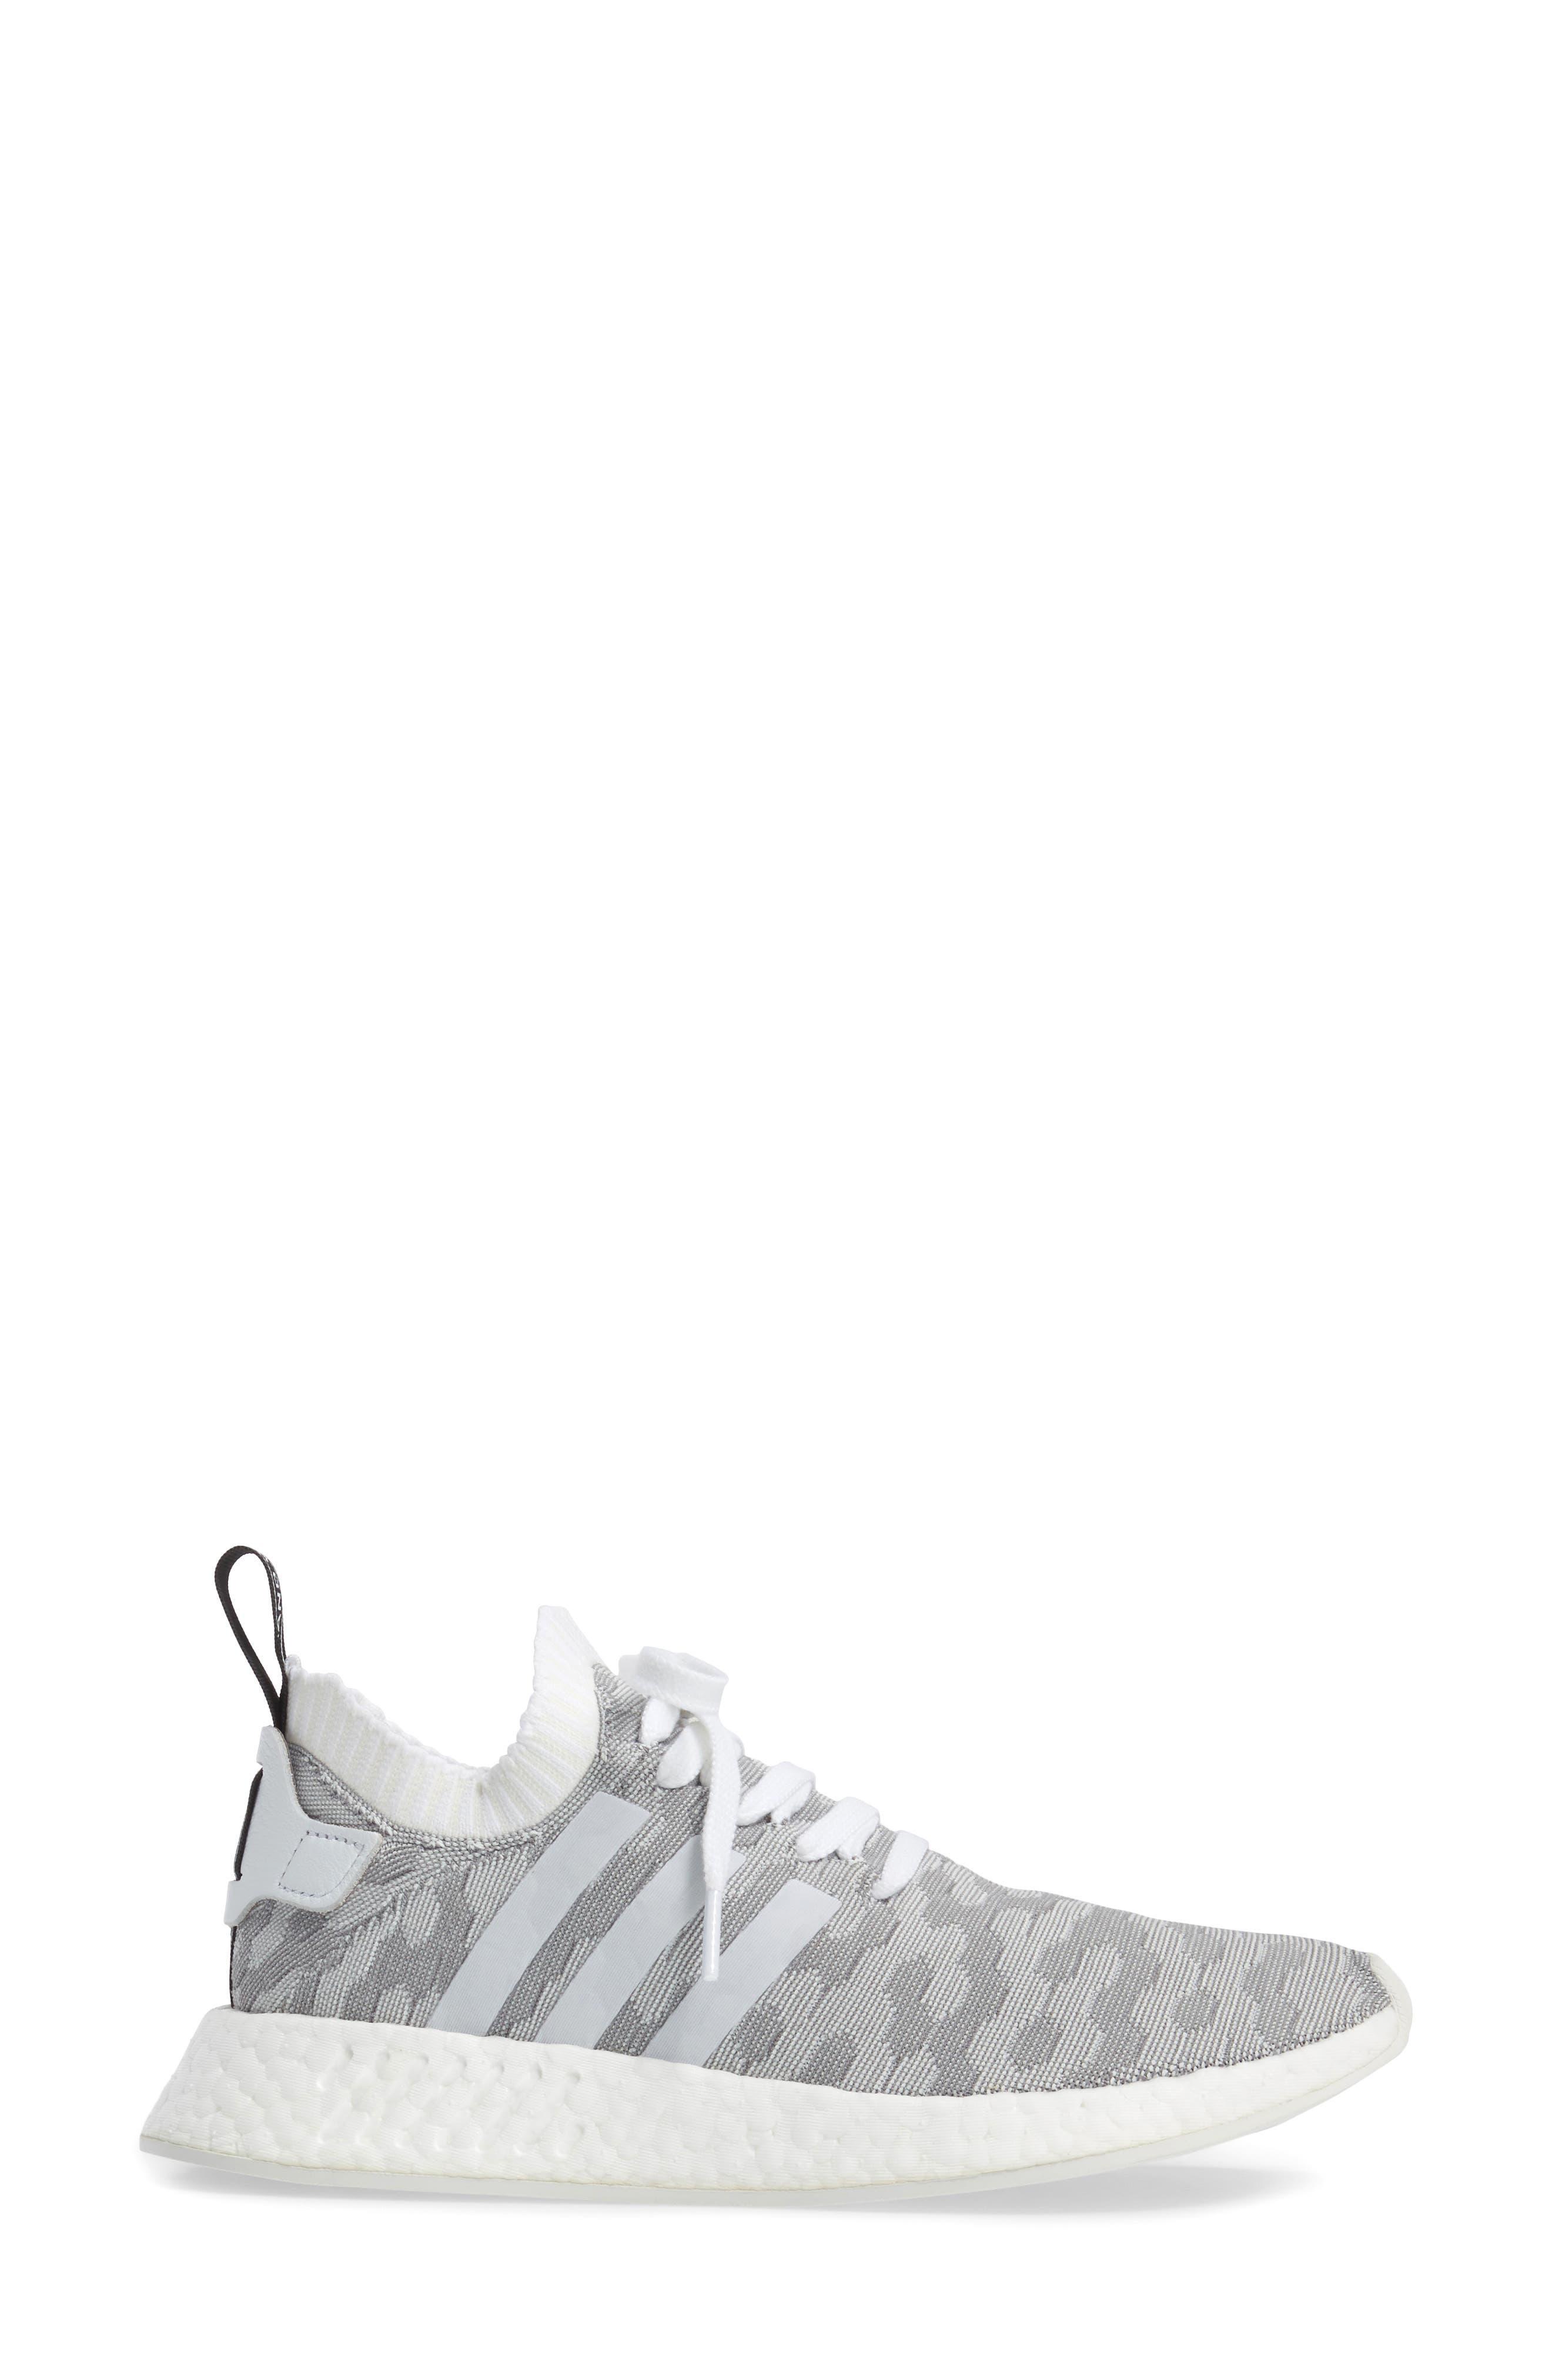 NMD R2 Primeknit Athletic Shoe,                             Alternate thumbnail 14, color,